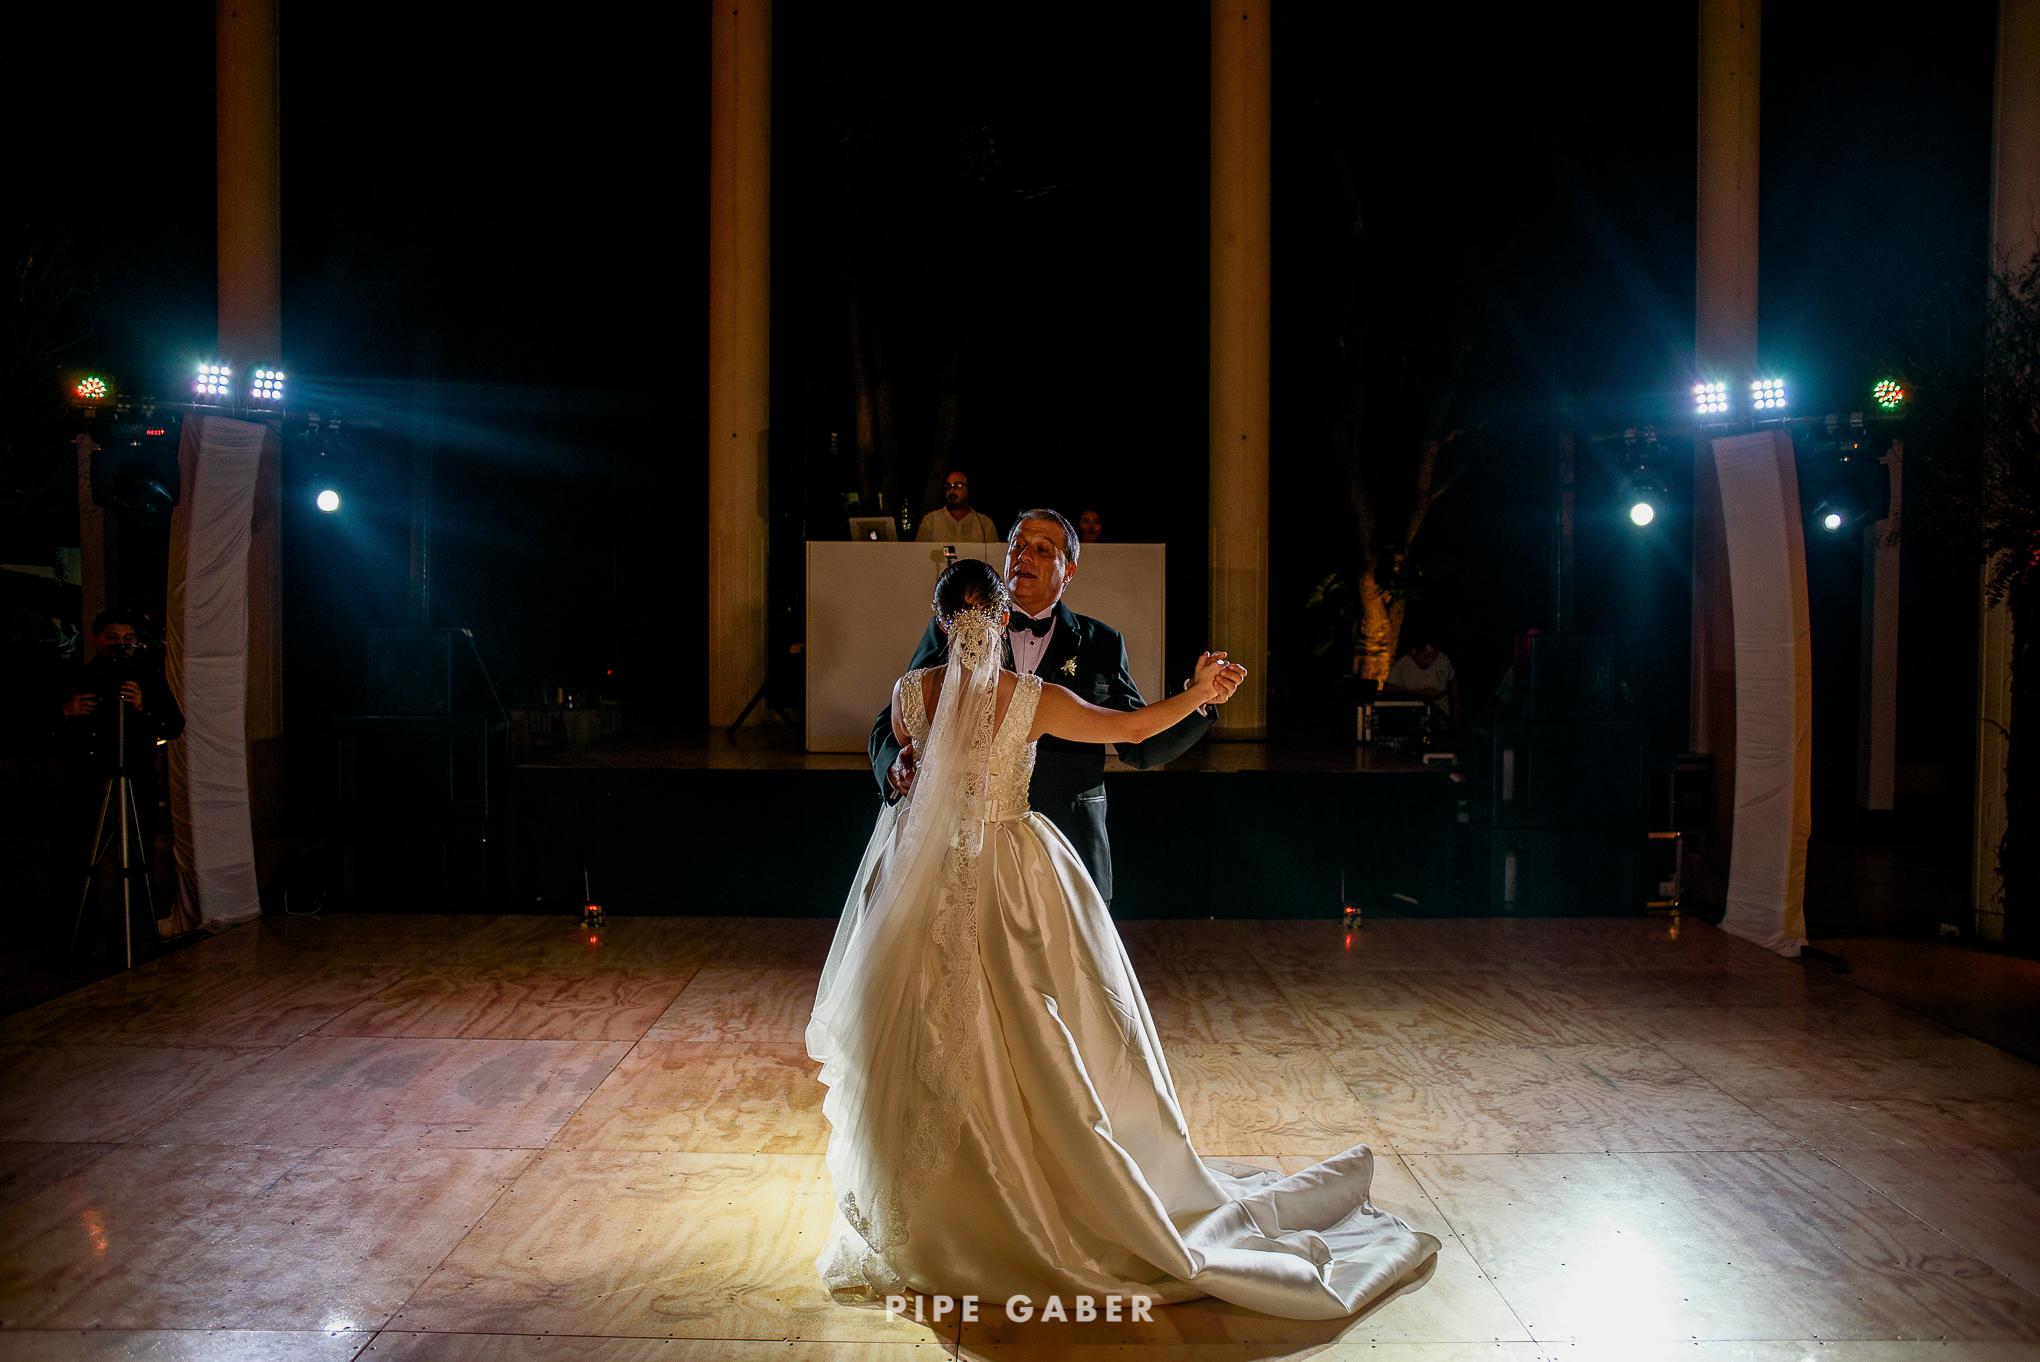 17_02_18_WEDDING_AIDITA_NEZBIT_MIGUEL_DOGRE_296_web.jpg